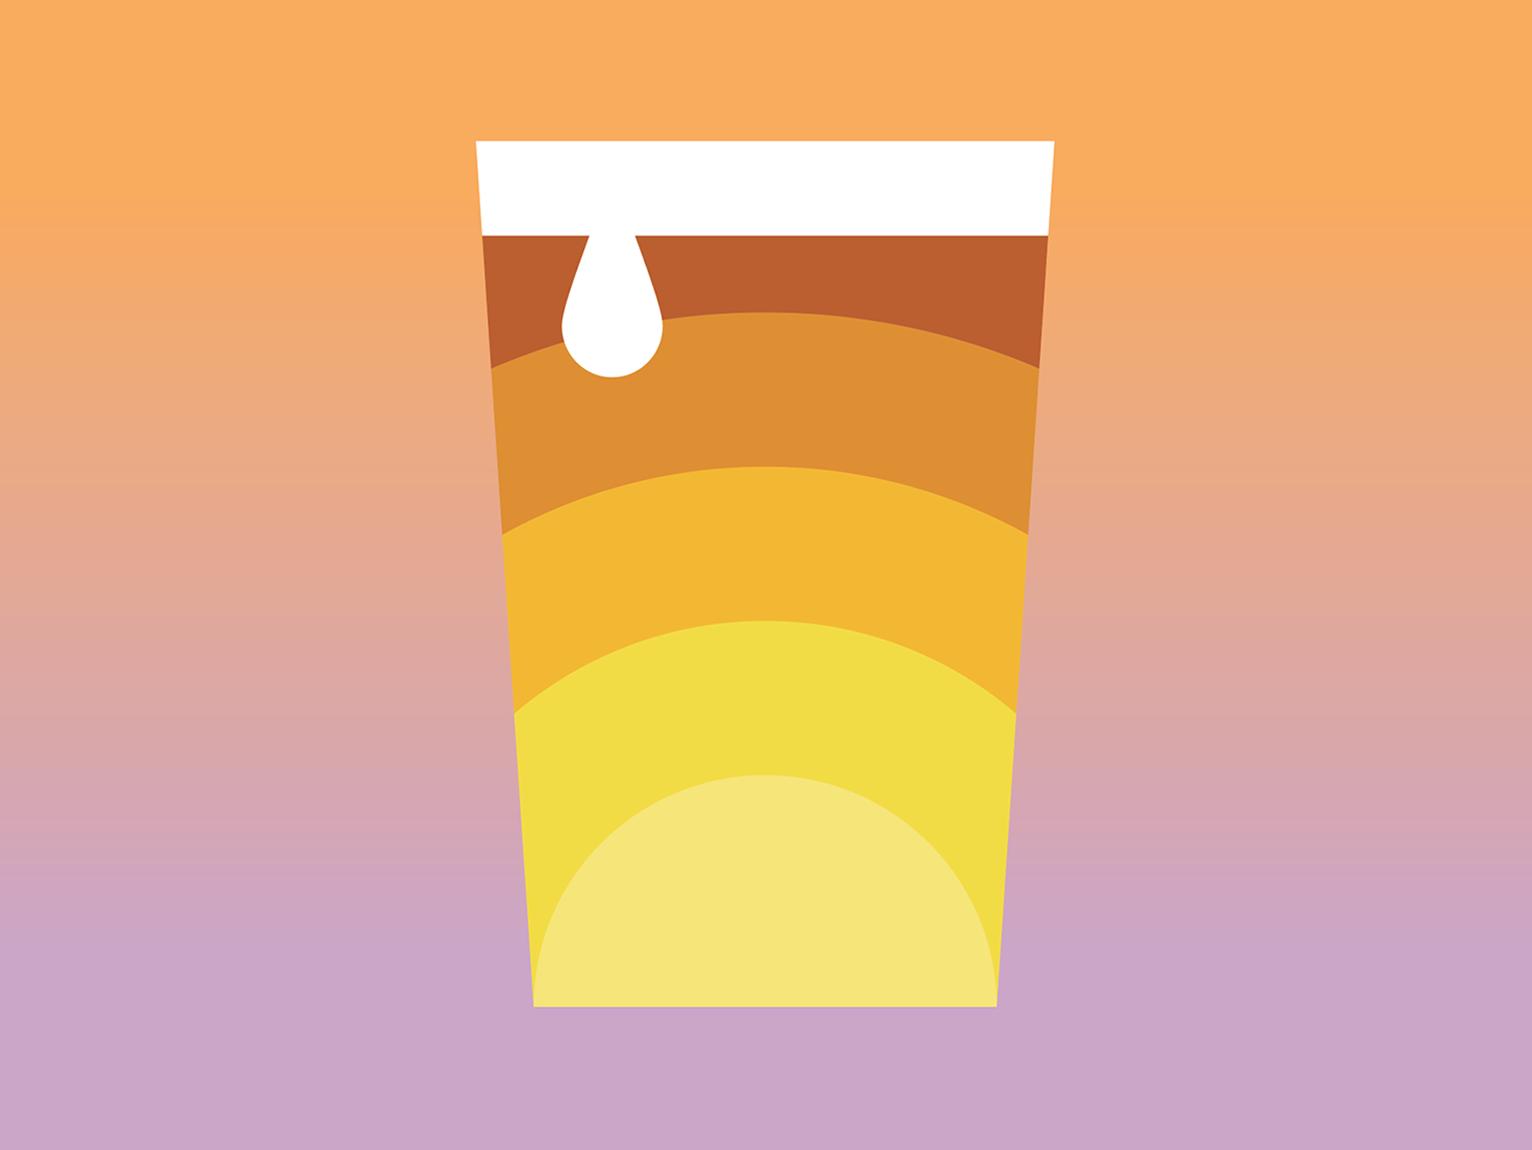 Summer sunsets beer branding beer art spring brewery warm beer can yellow orange pink beer label draplin flat sunrise sunset summer beer